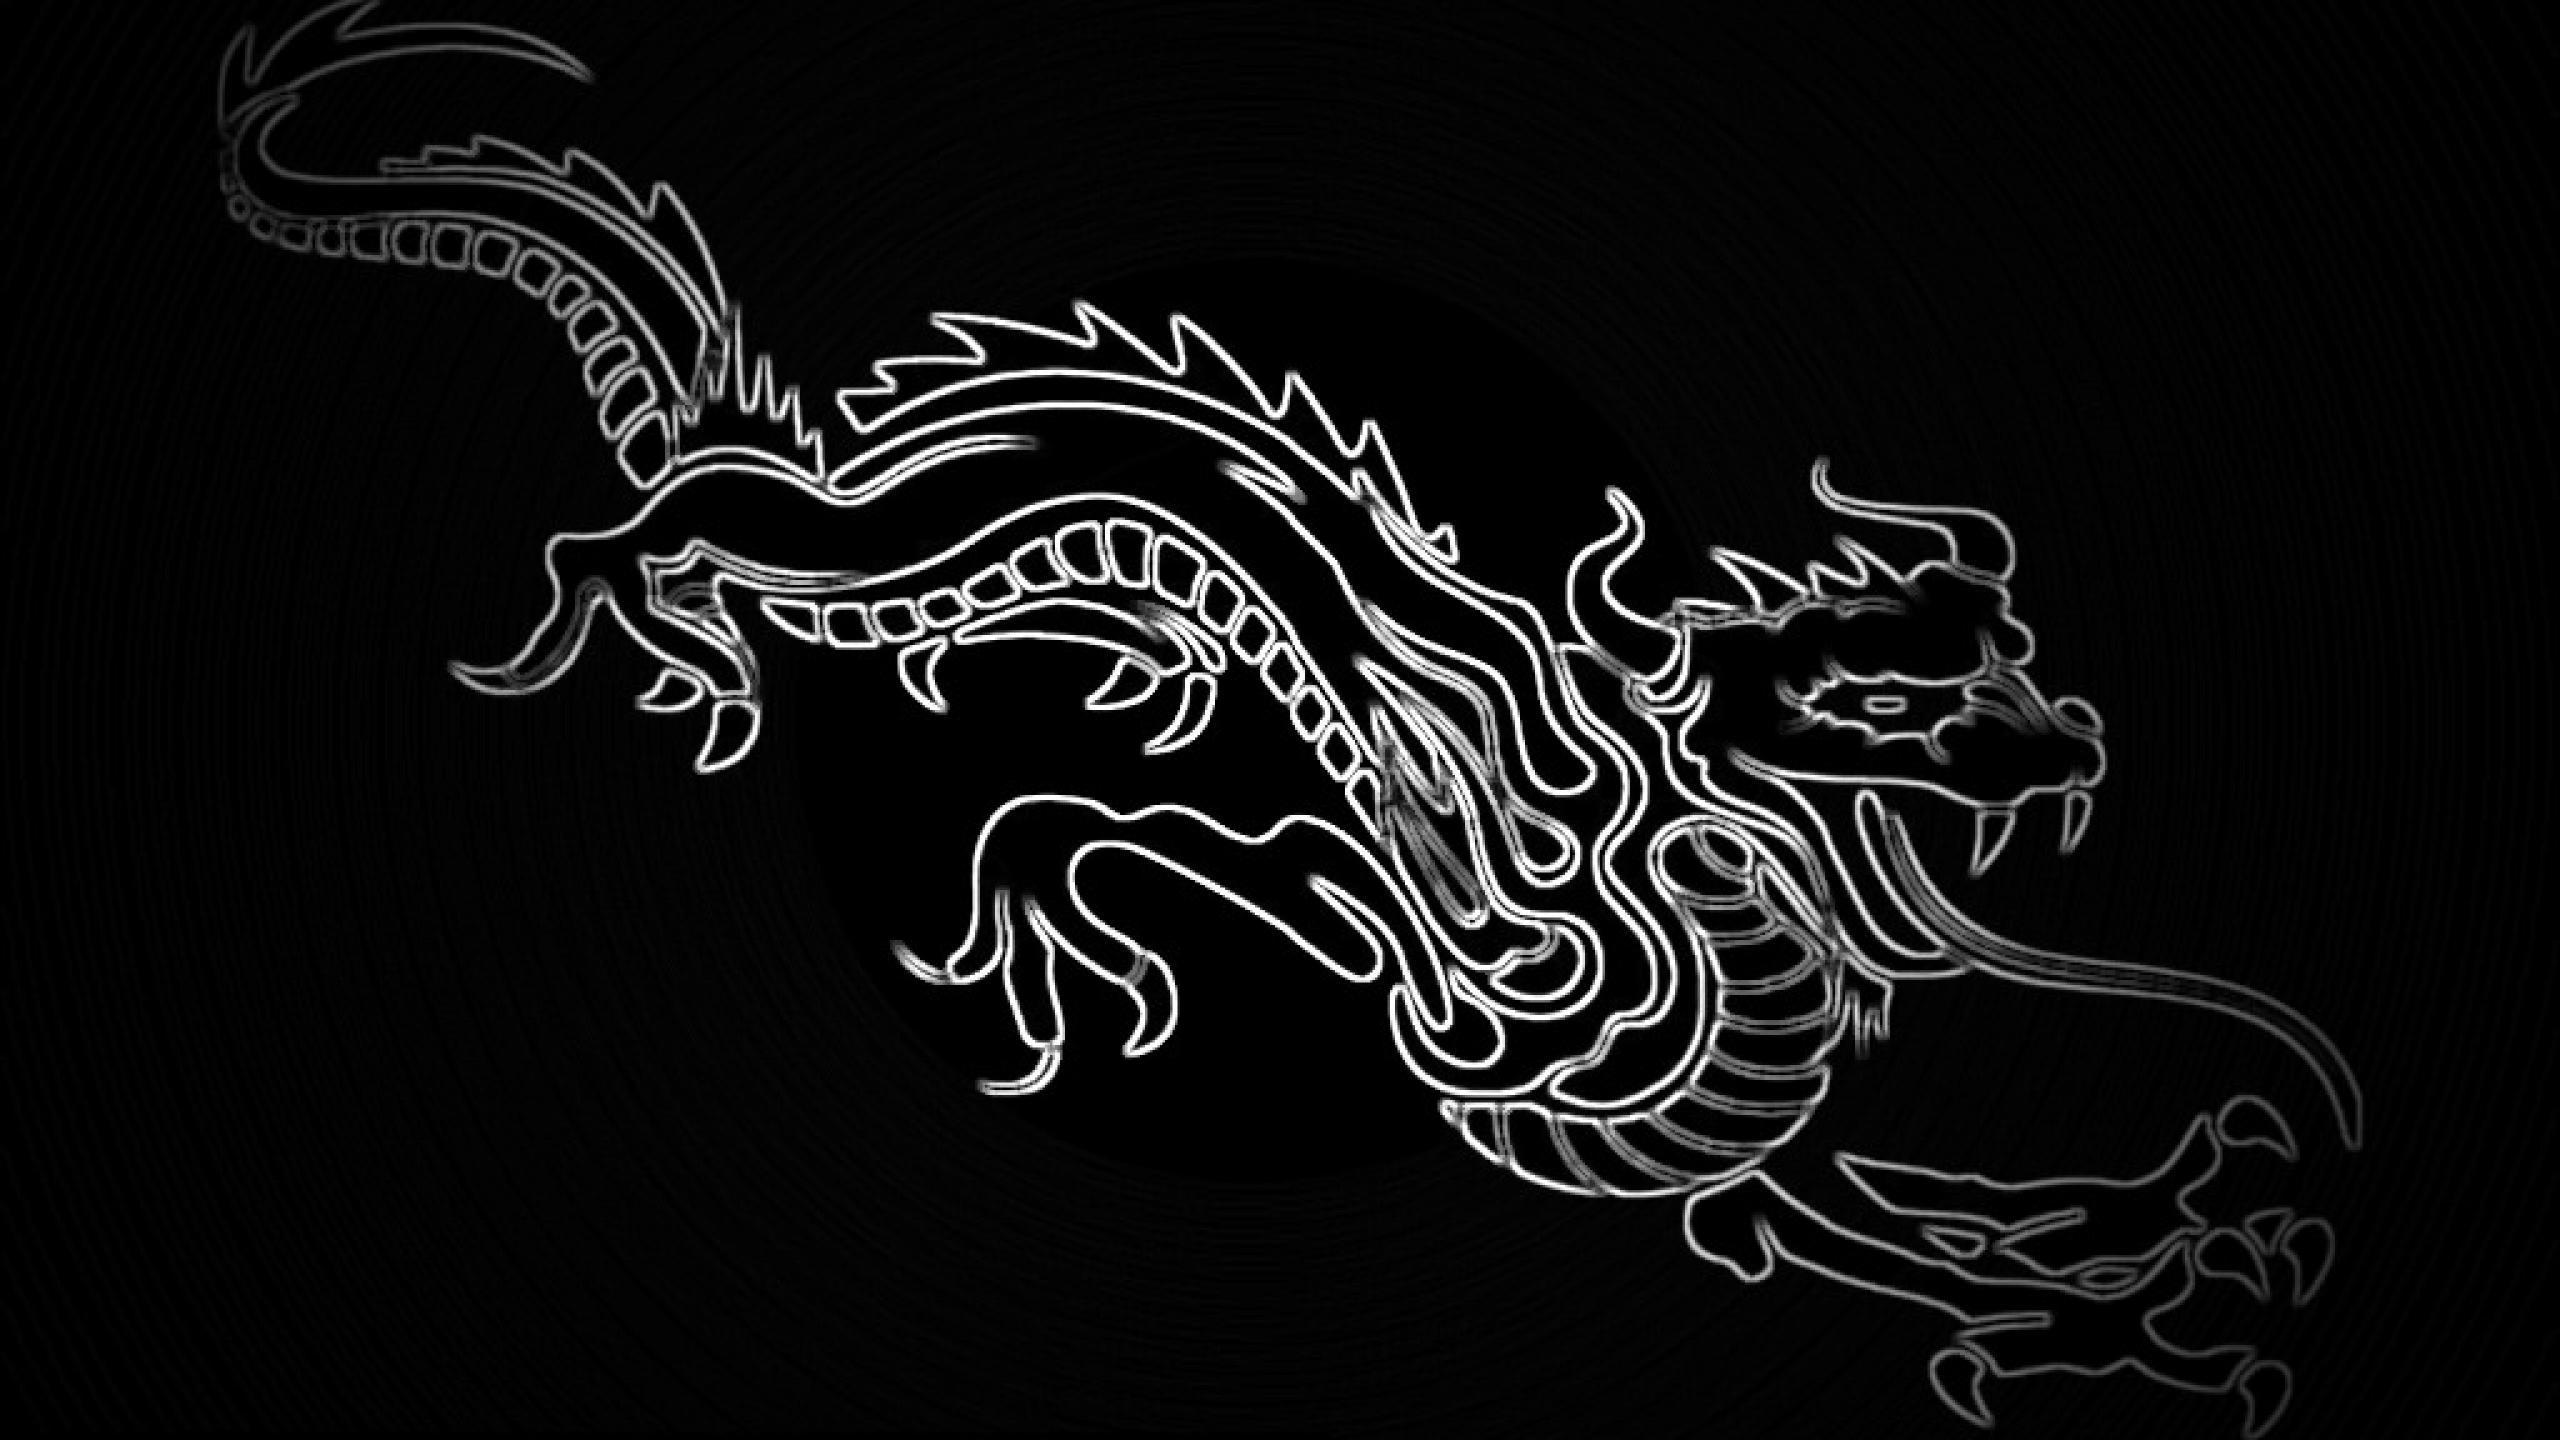 Ubuntu Dragon Wallpapers 2560x1440